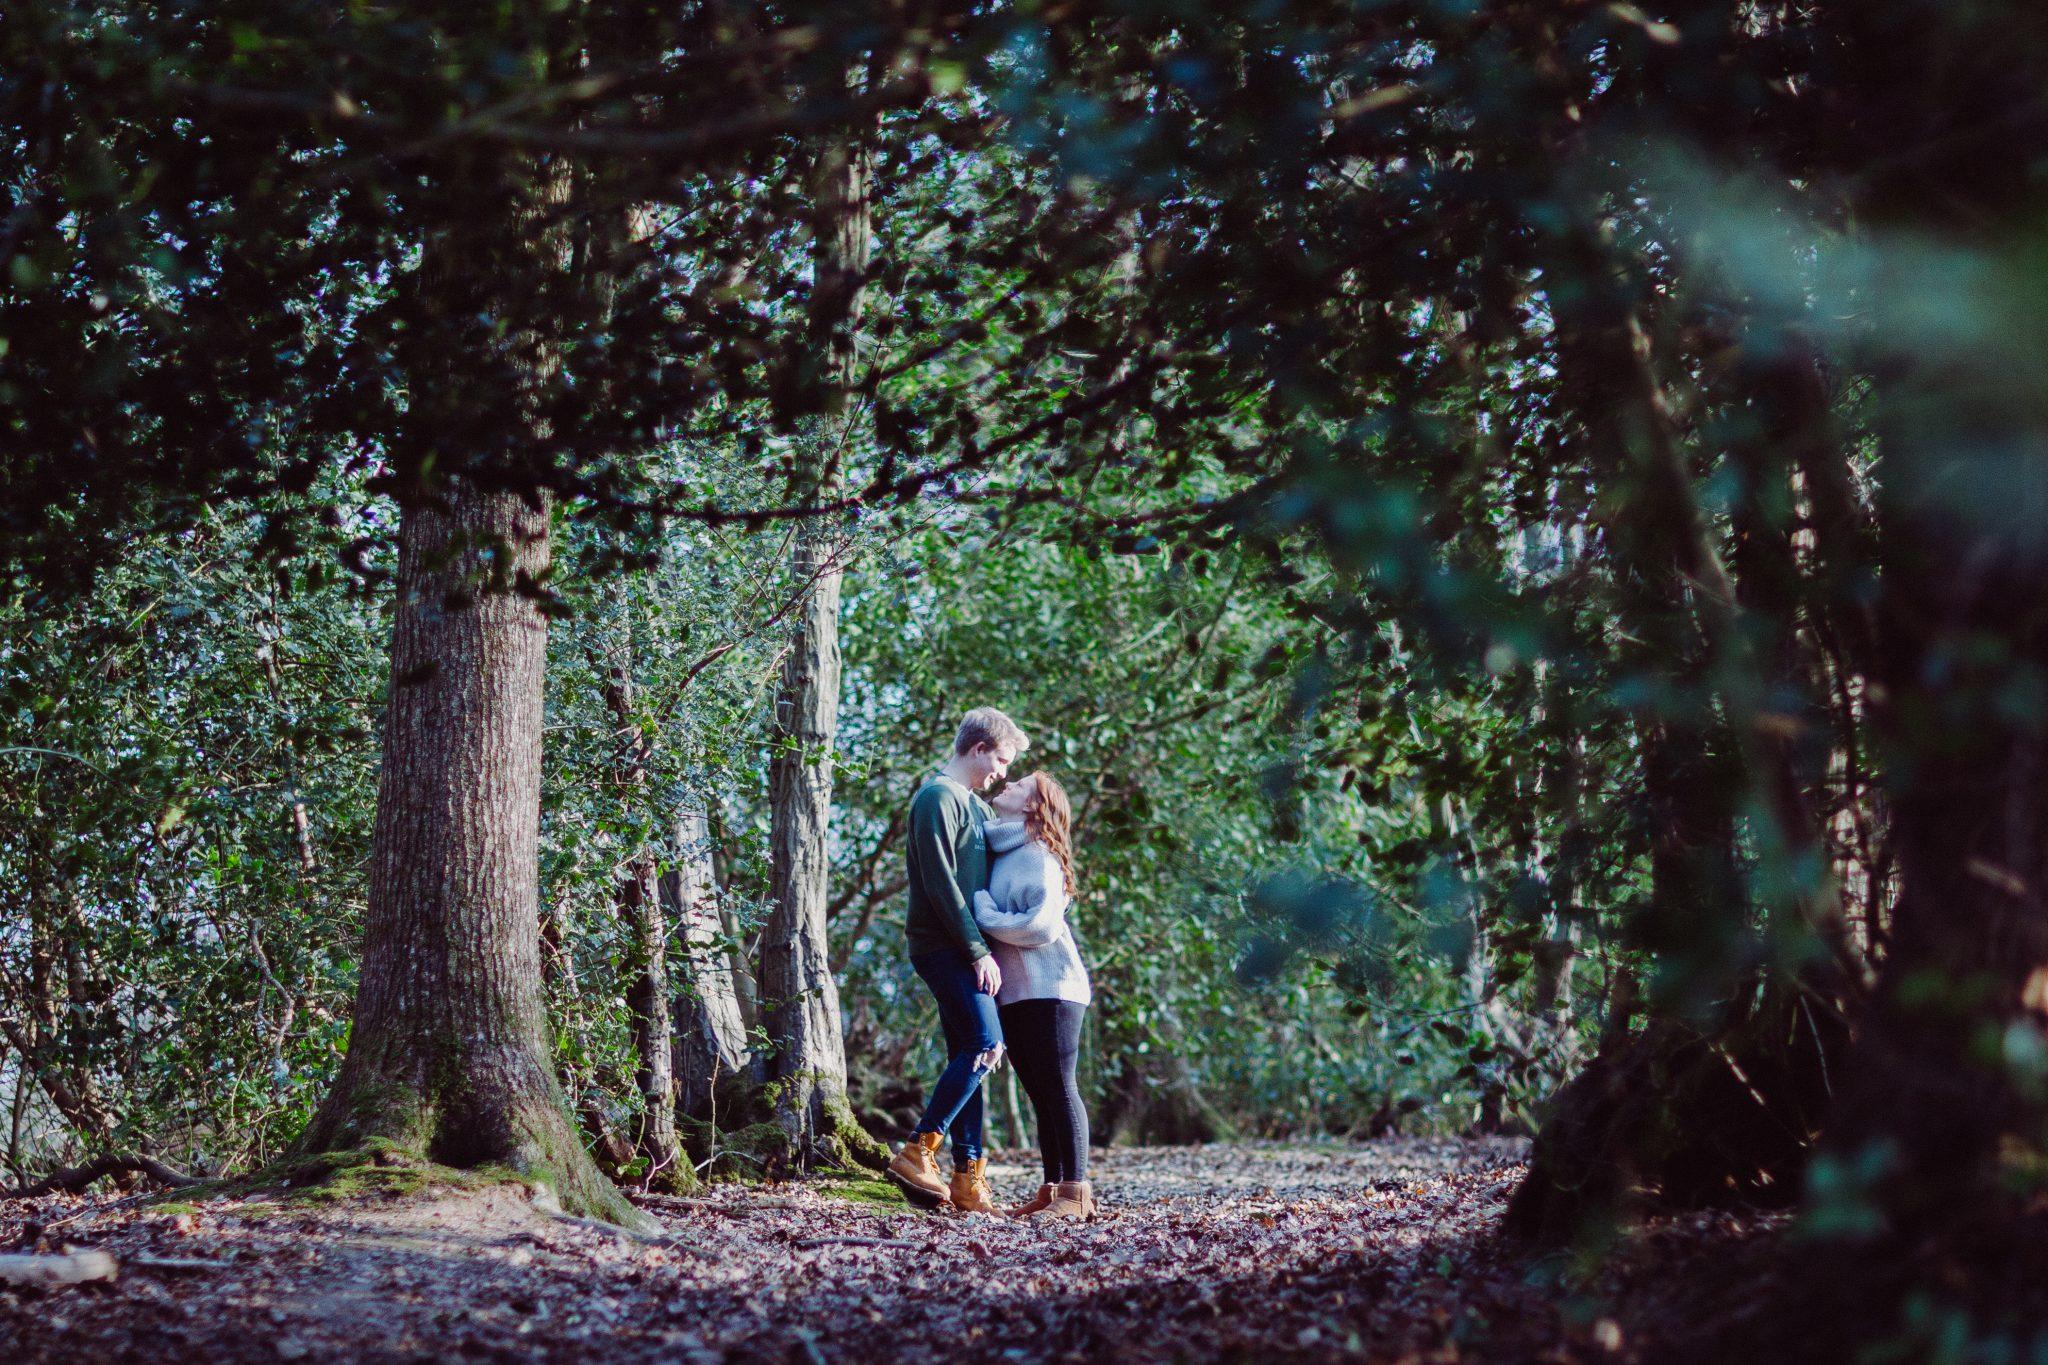 S Butler Photography - Wedding Photographer Sussex - Kat & Bailey-0178